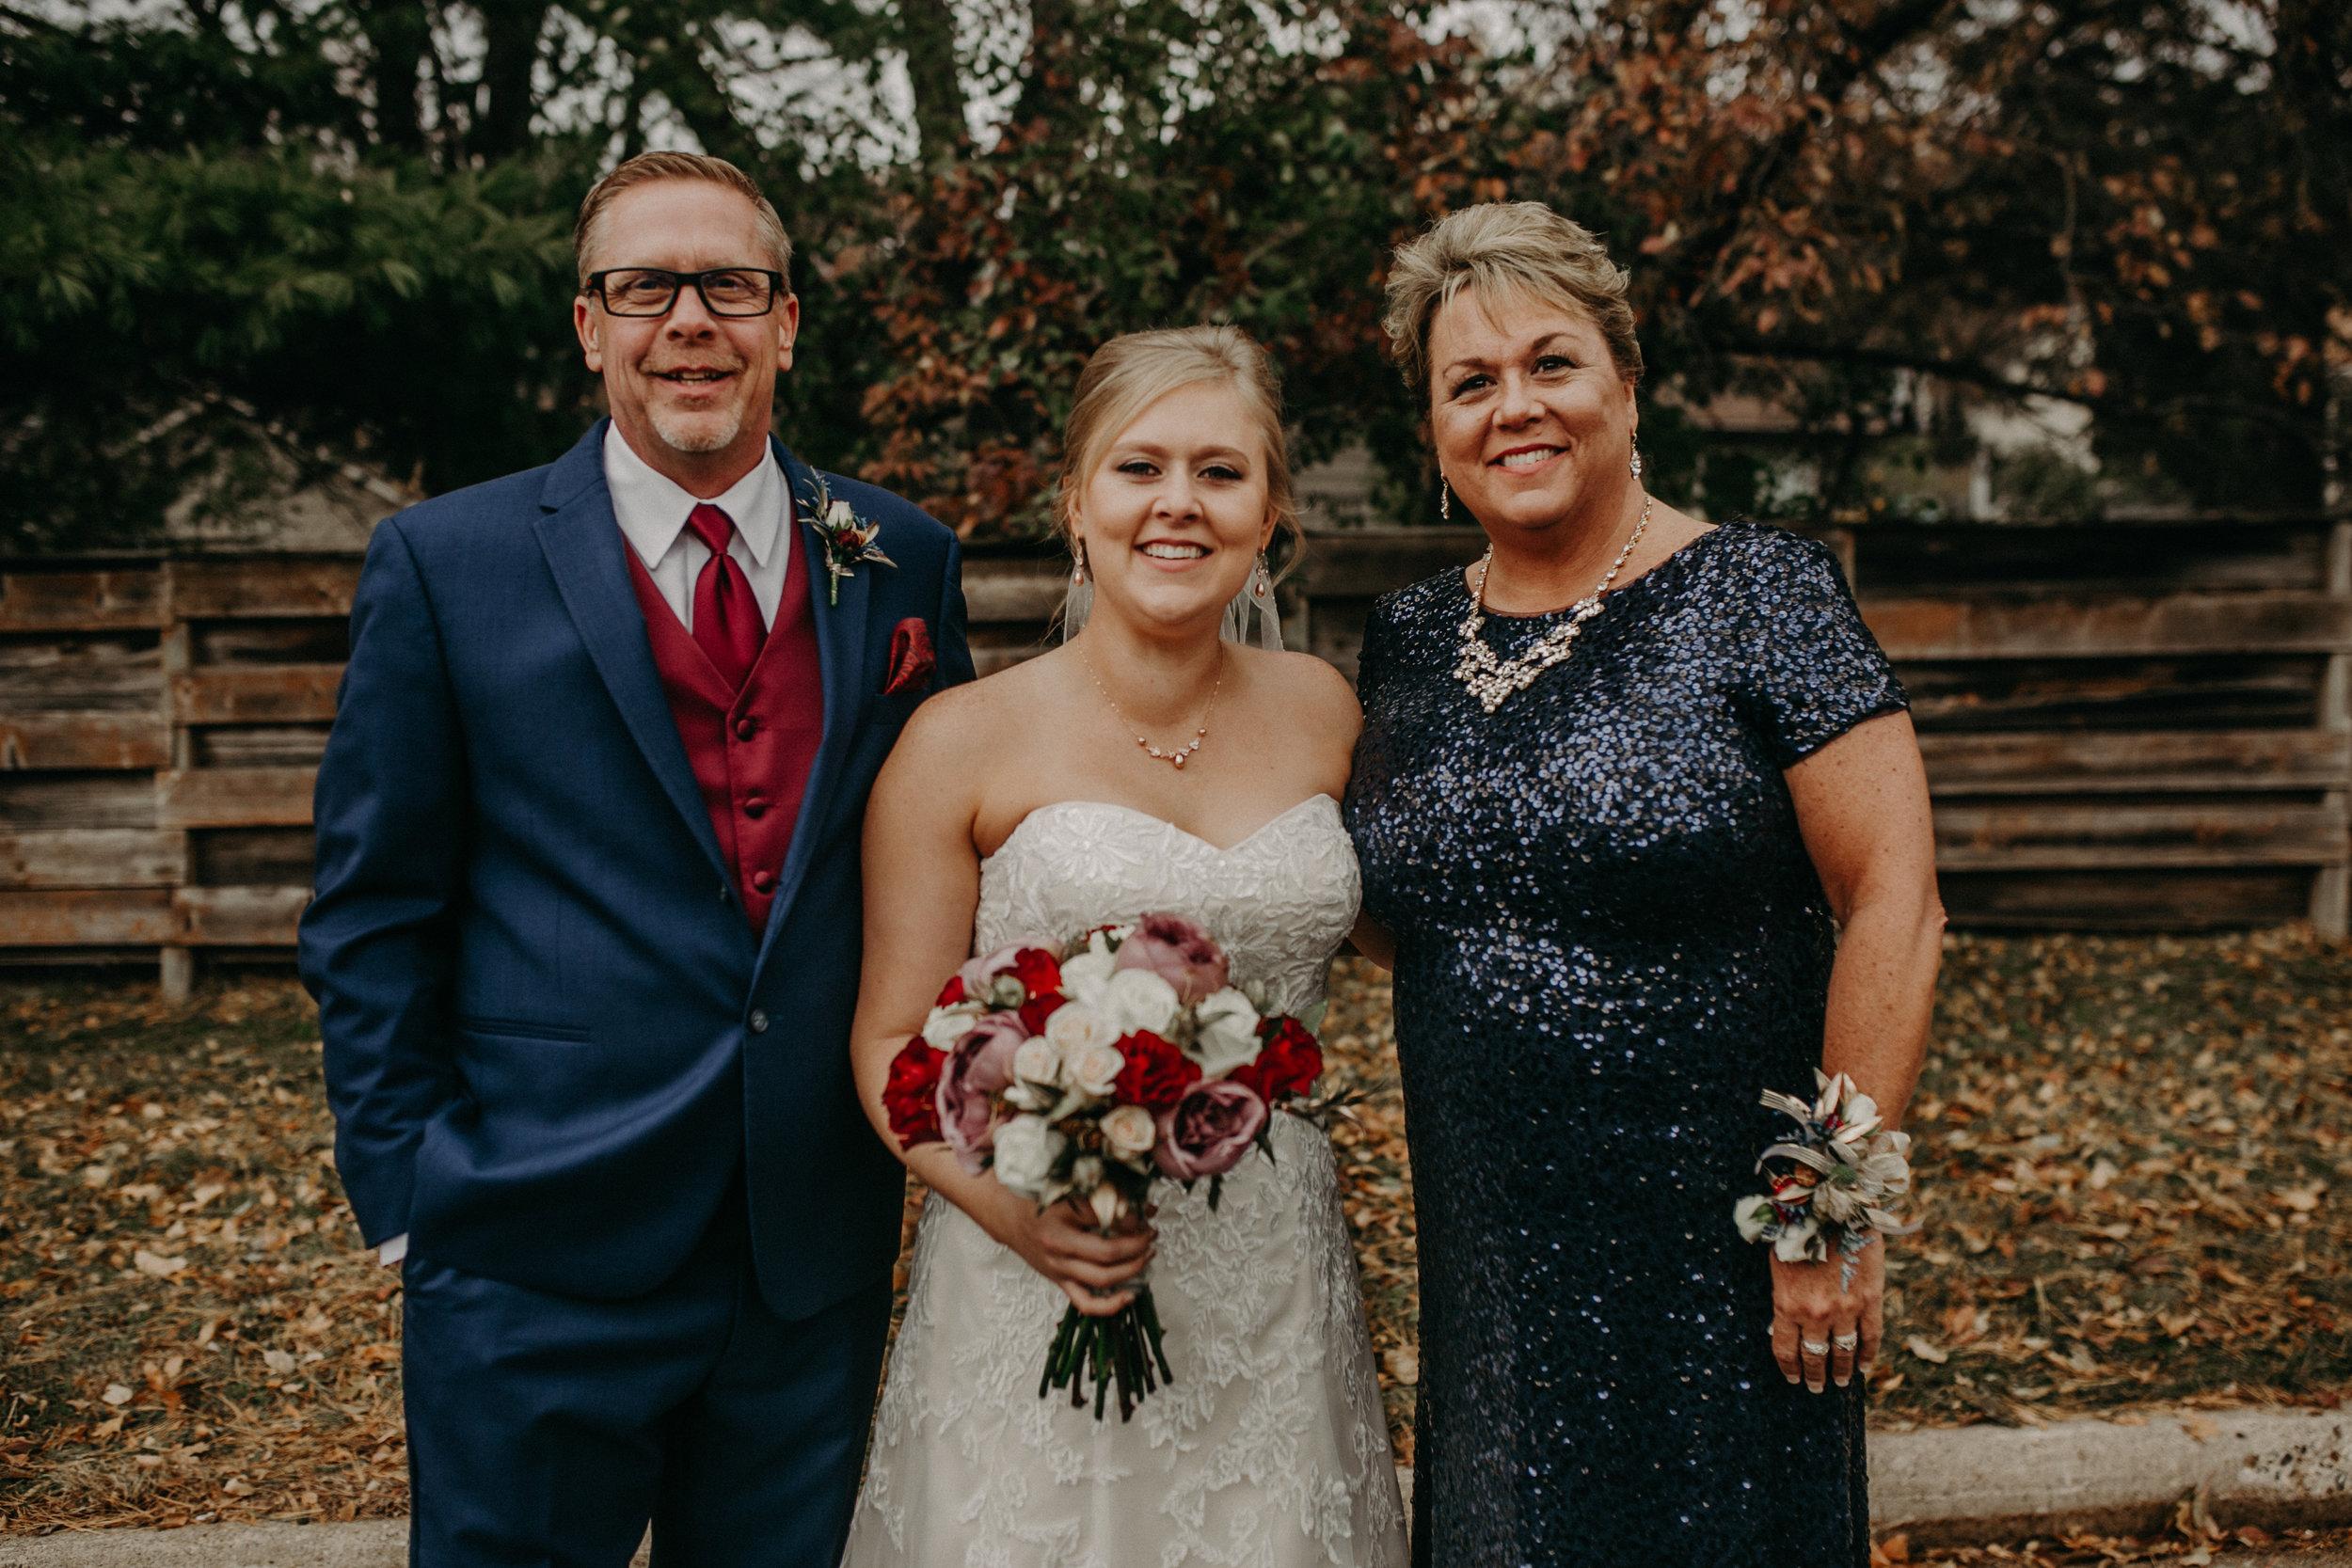 Weisenbeck_Wedding_Oct2018-166.jpg